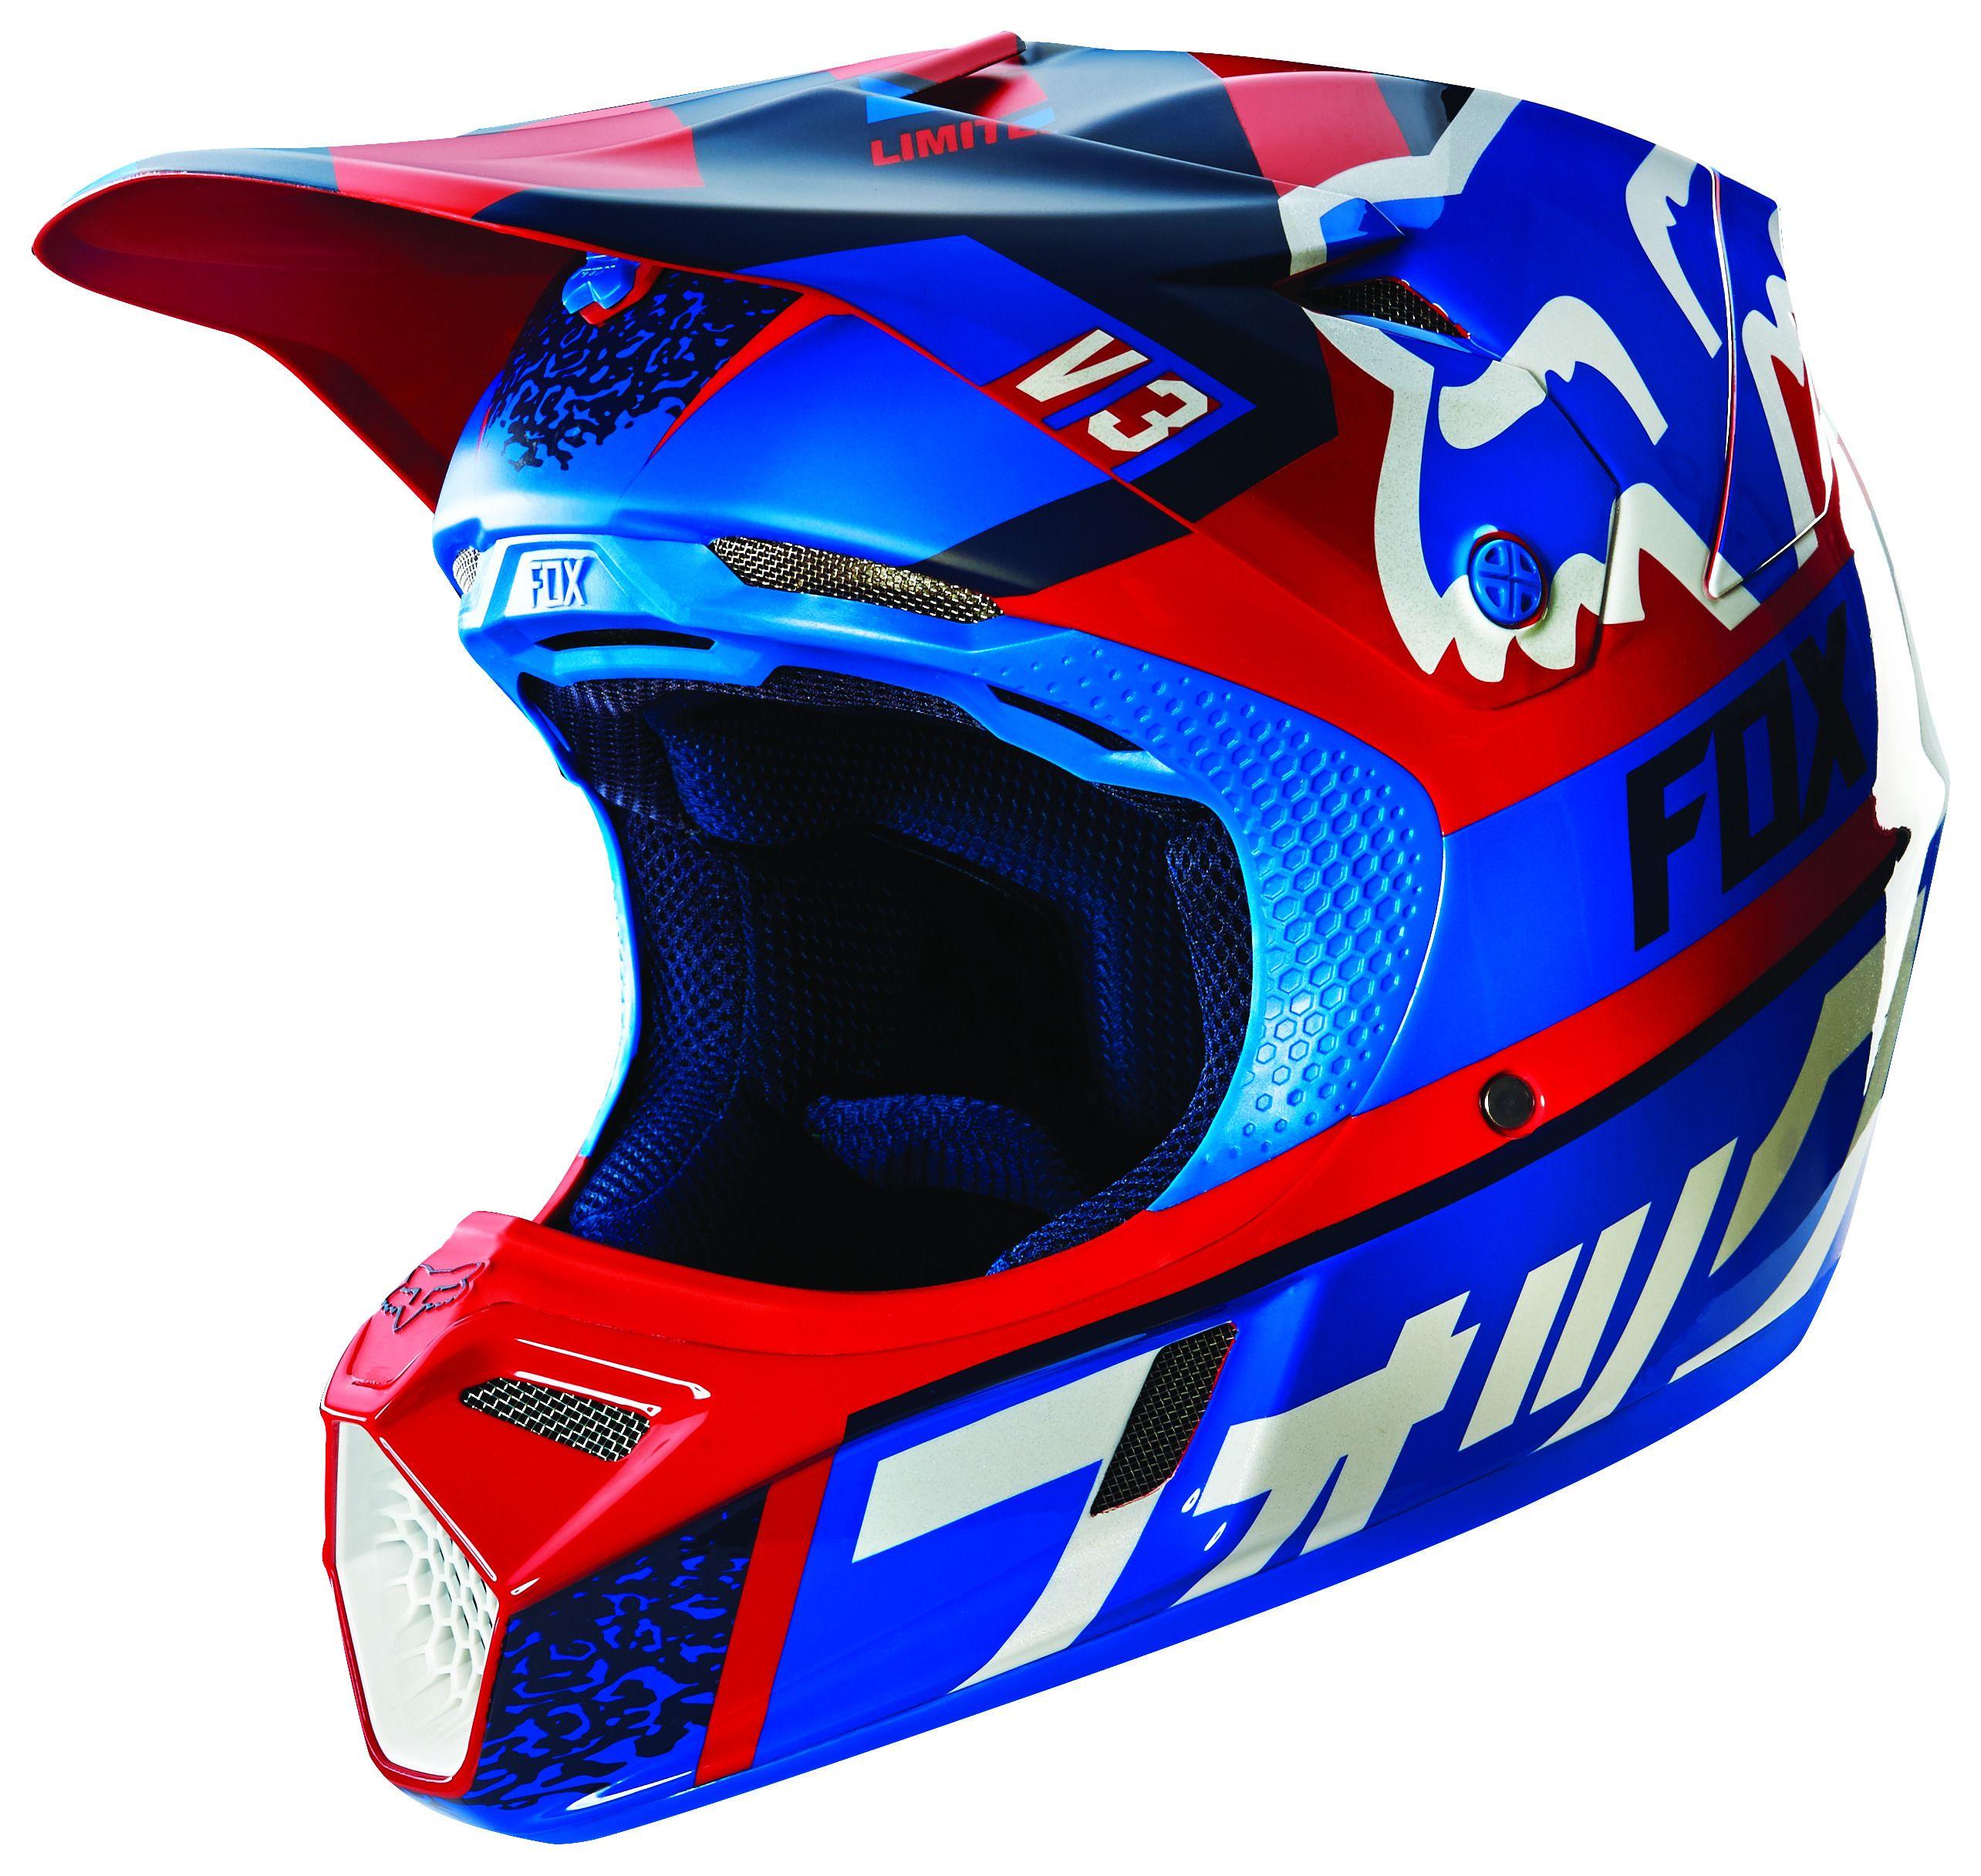 fox racing v3 divizion helmet revzilla. Black Bedroom Furniture Sets. Home Design Ideas